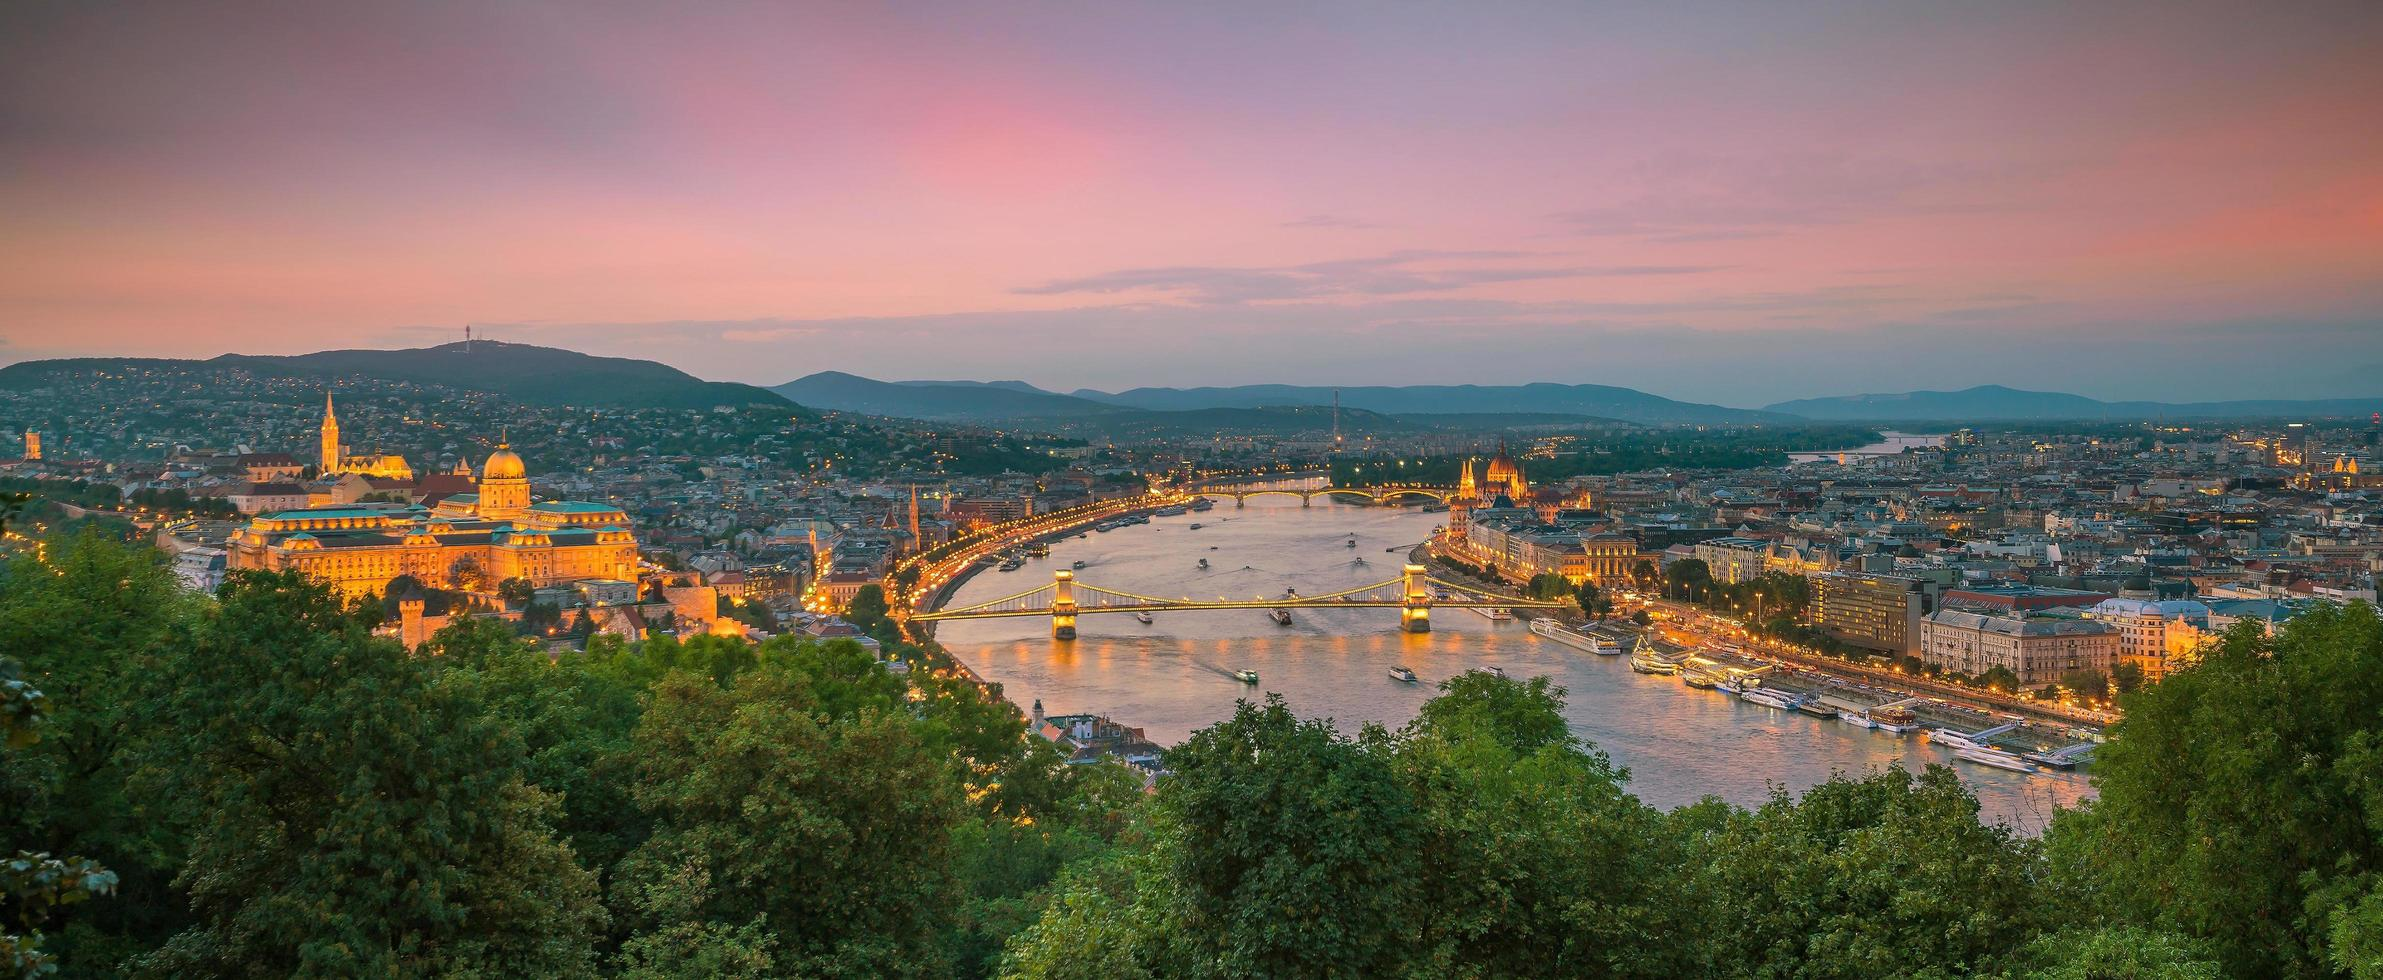 centrala Budapest i Ungern foto